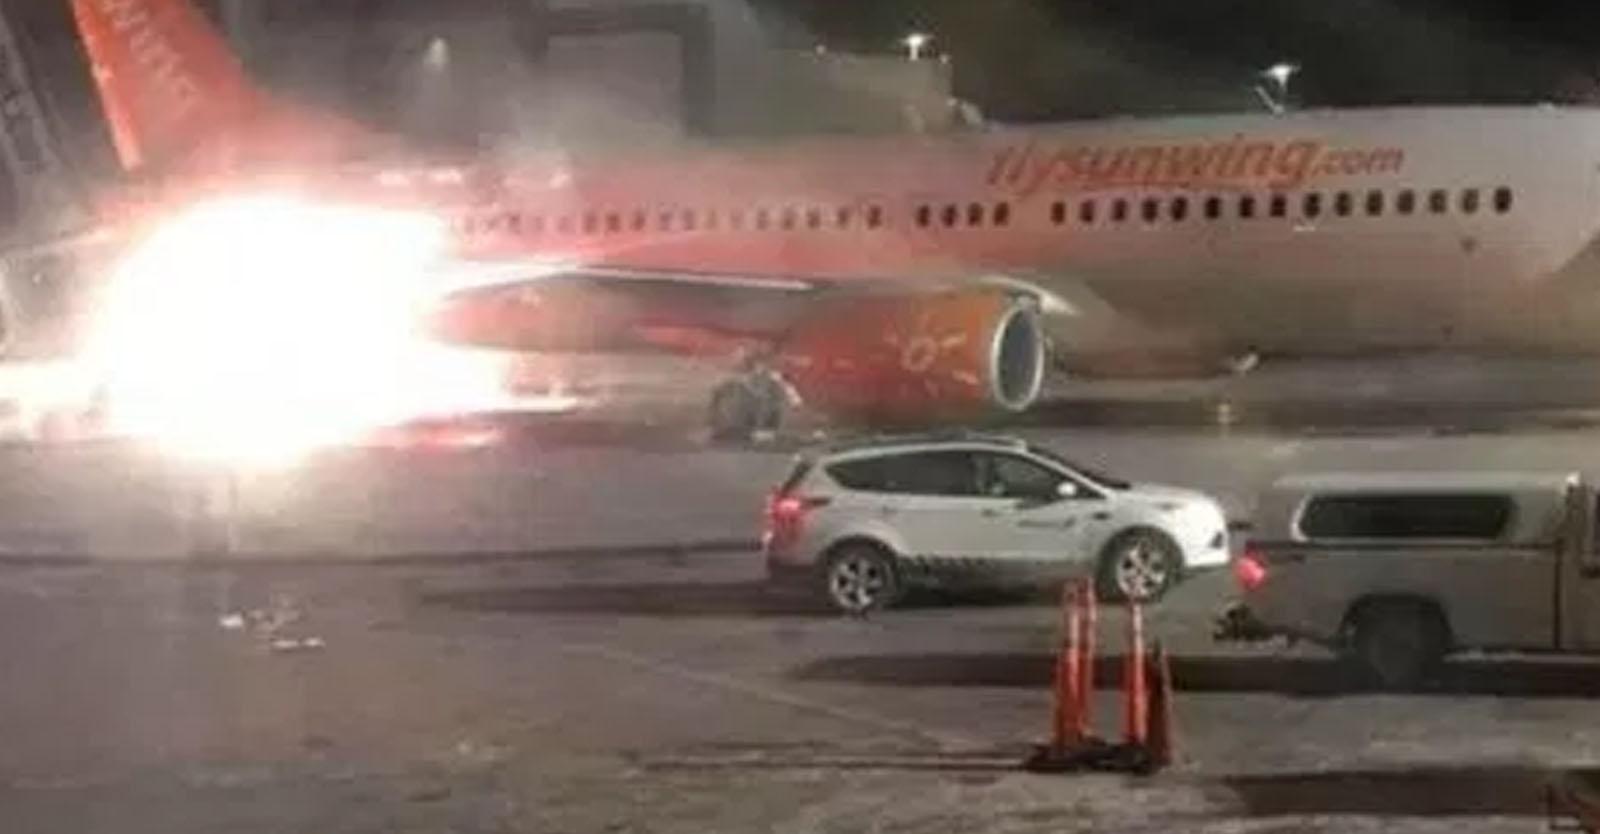 incendio-aviones-cancun